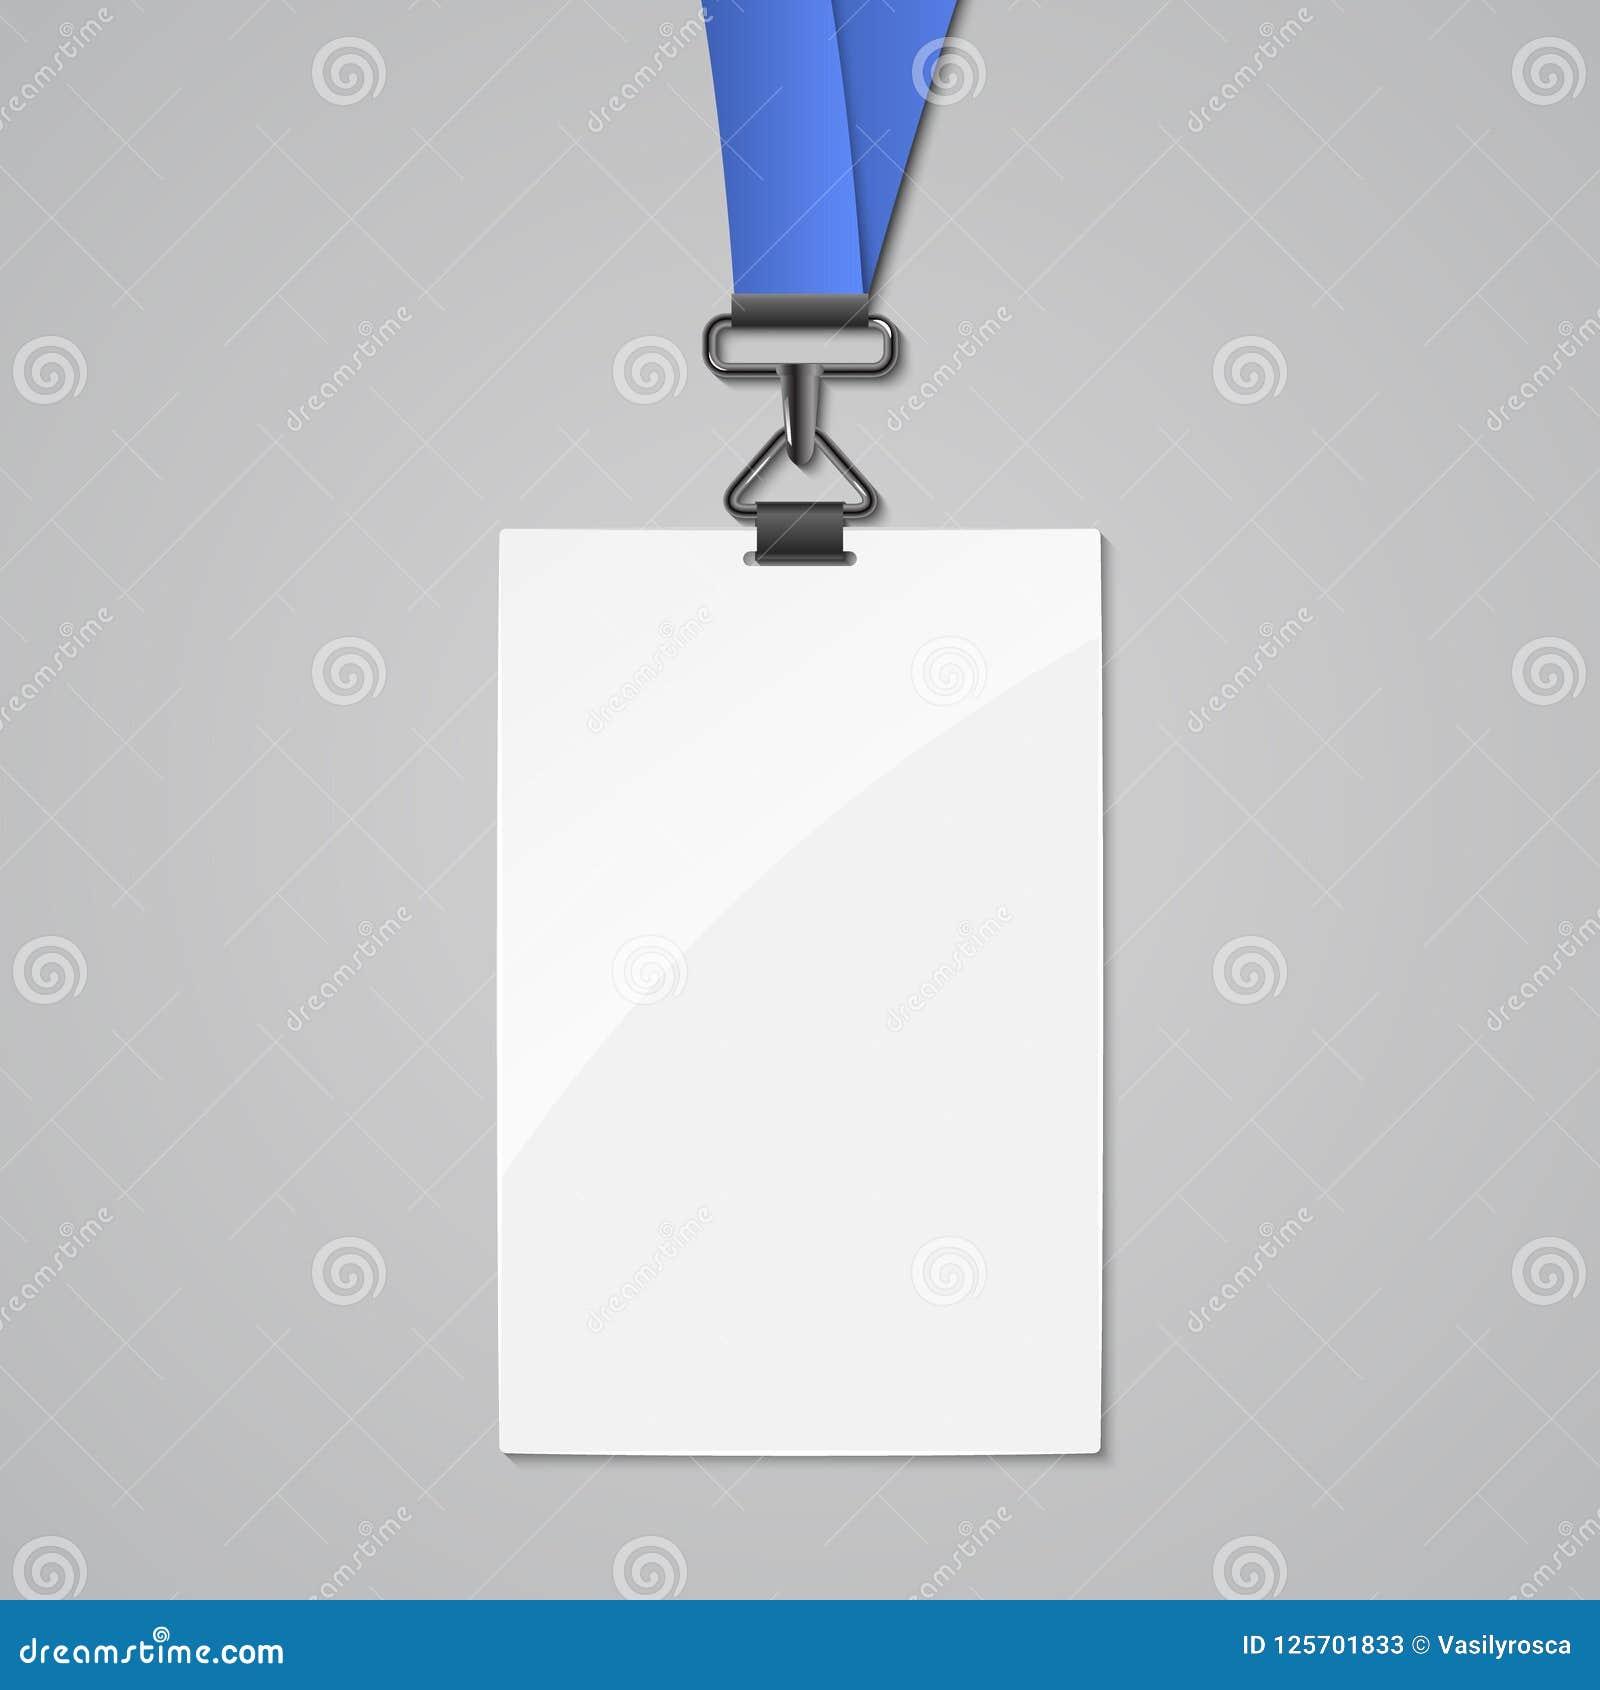 lanyard badge id card template blank identity lanyard